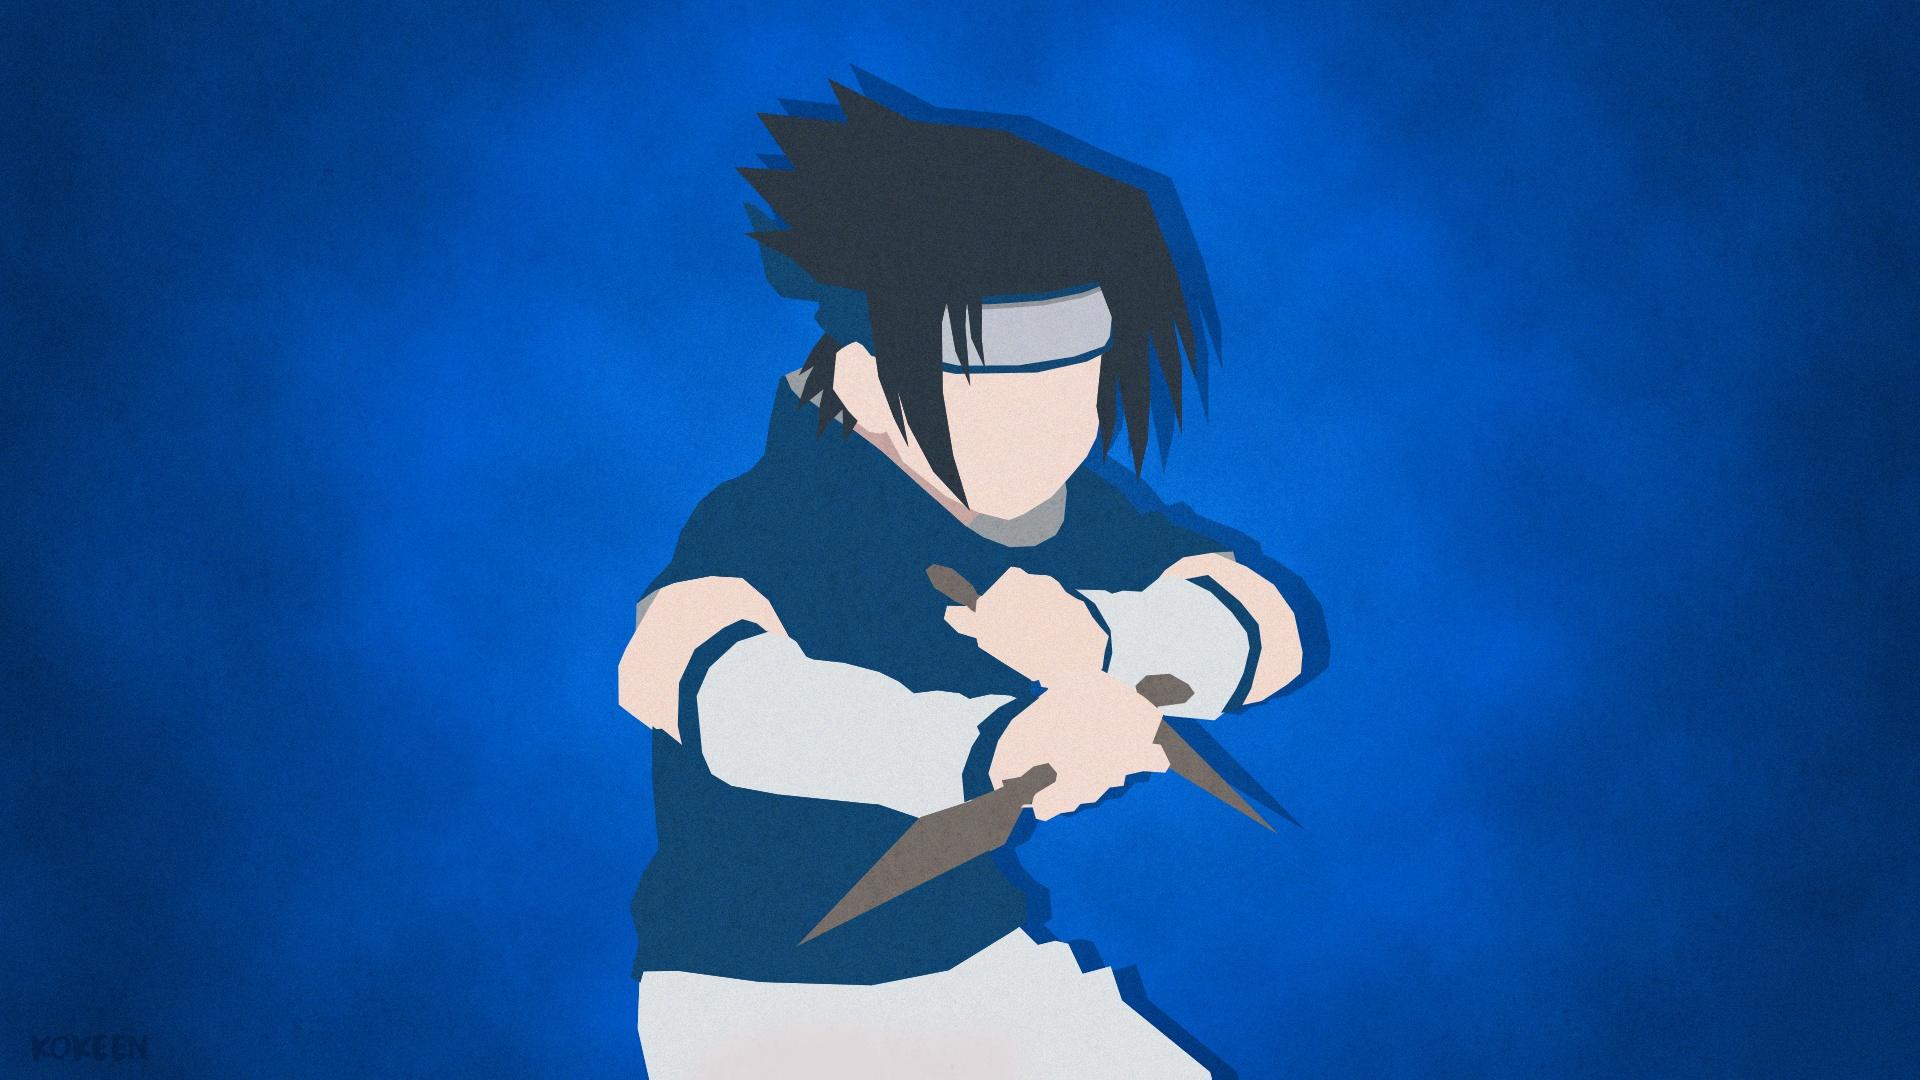 Sasuke desktop background